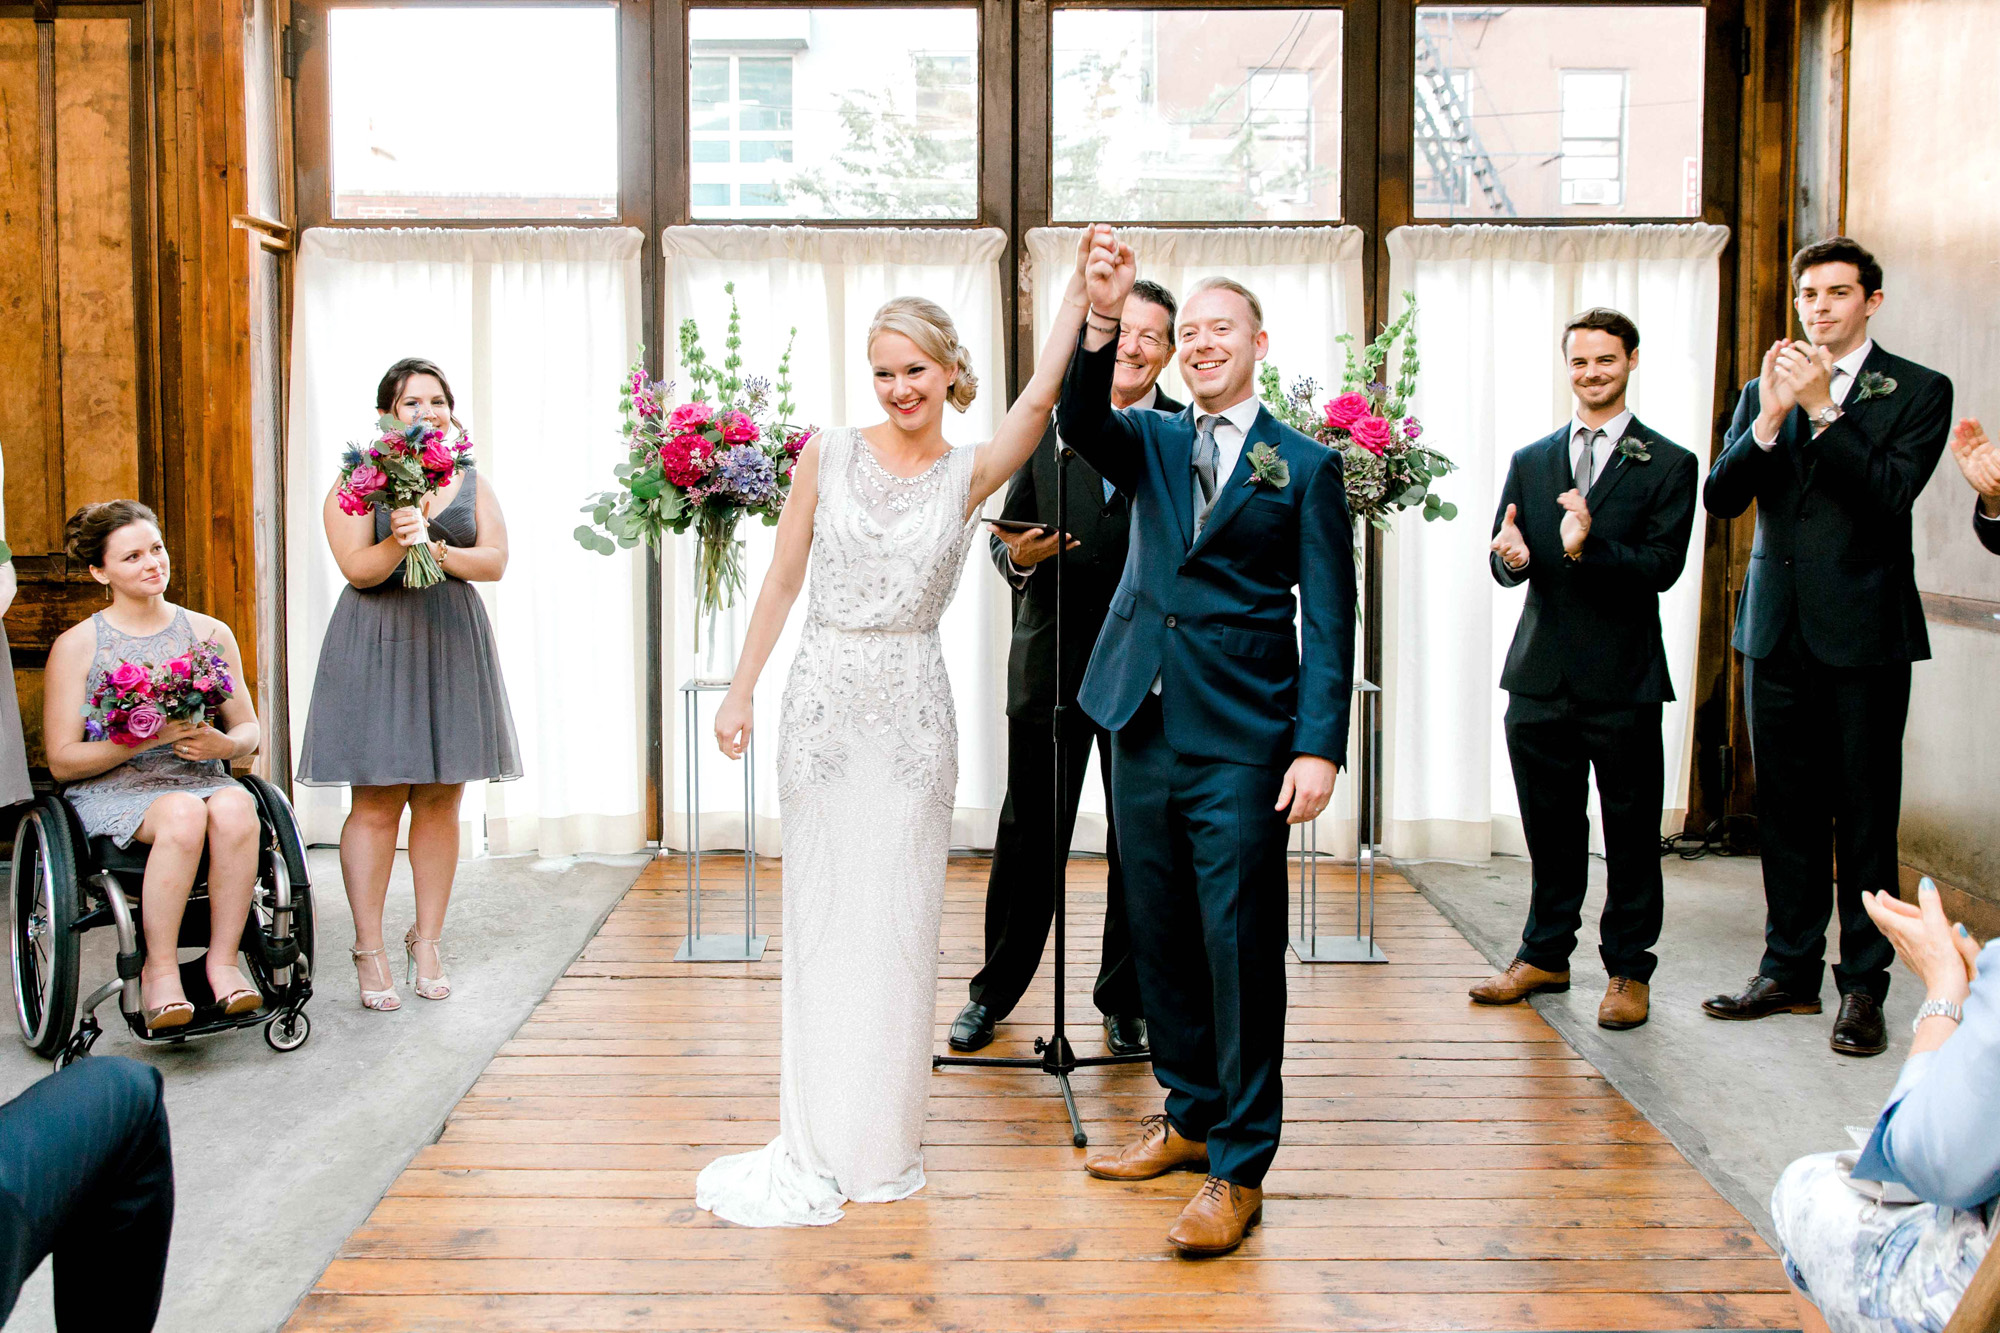 33_Kasey_Paul_Brooklyn_Winery_Wedding_133.jpg